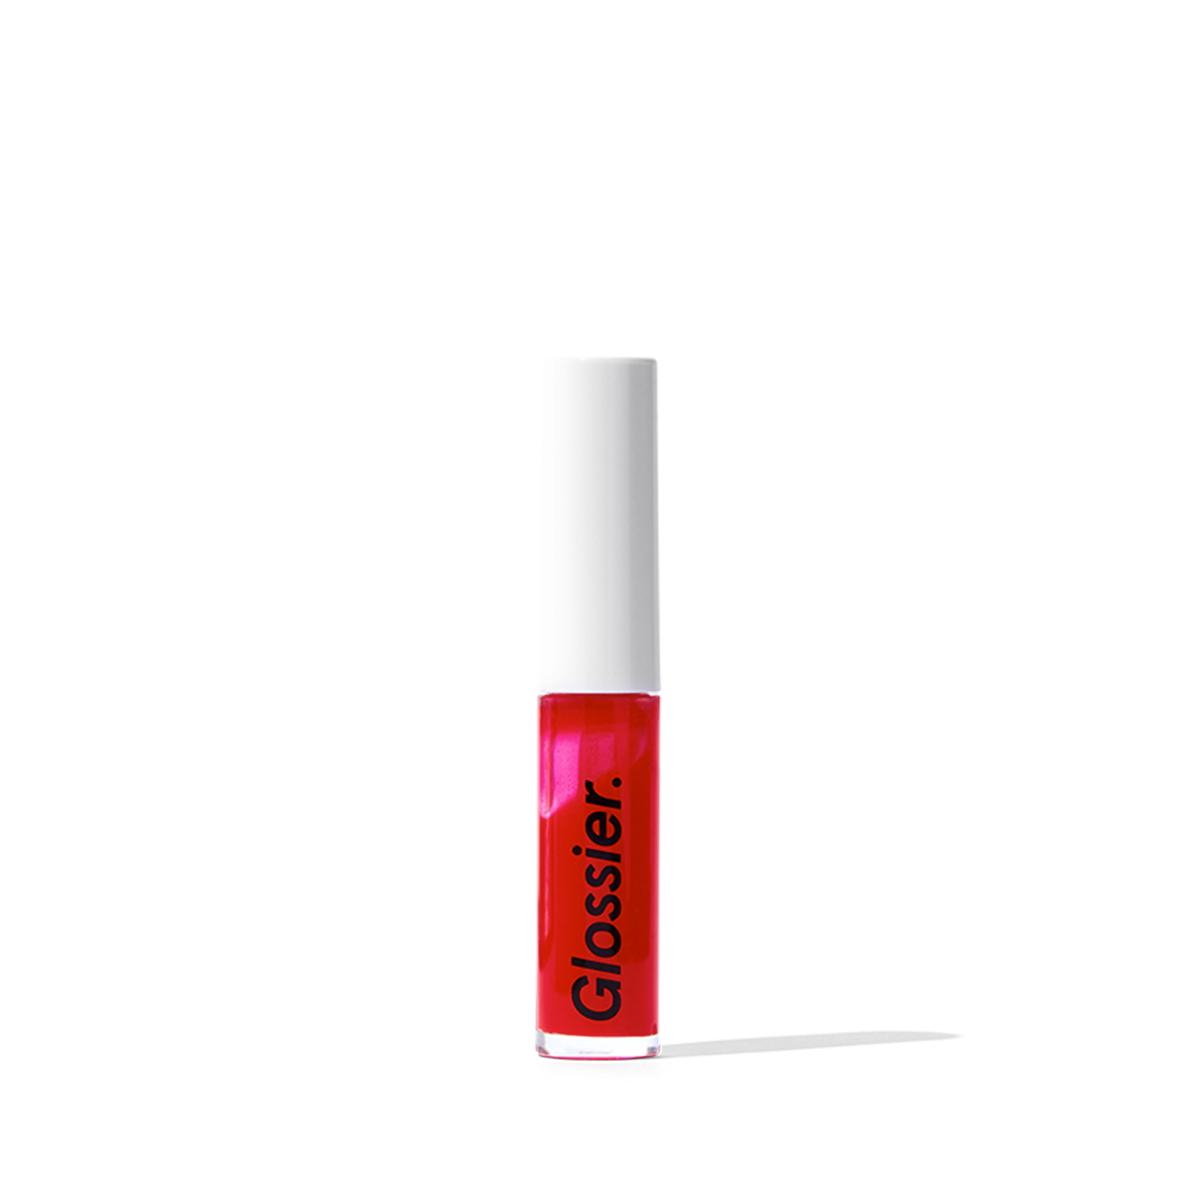 Lip Gloss Glossier Glossier Lip Gloss Glossy Lips Lip Gloss